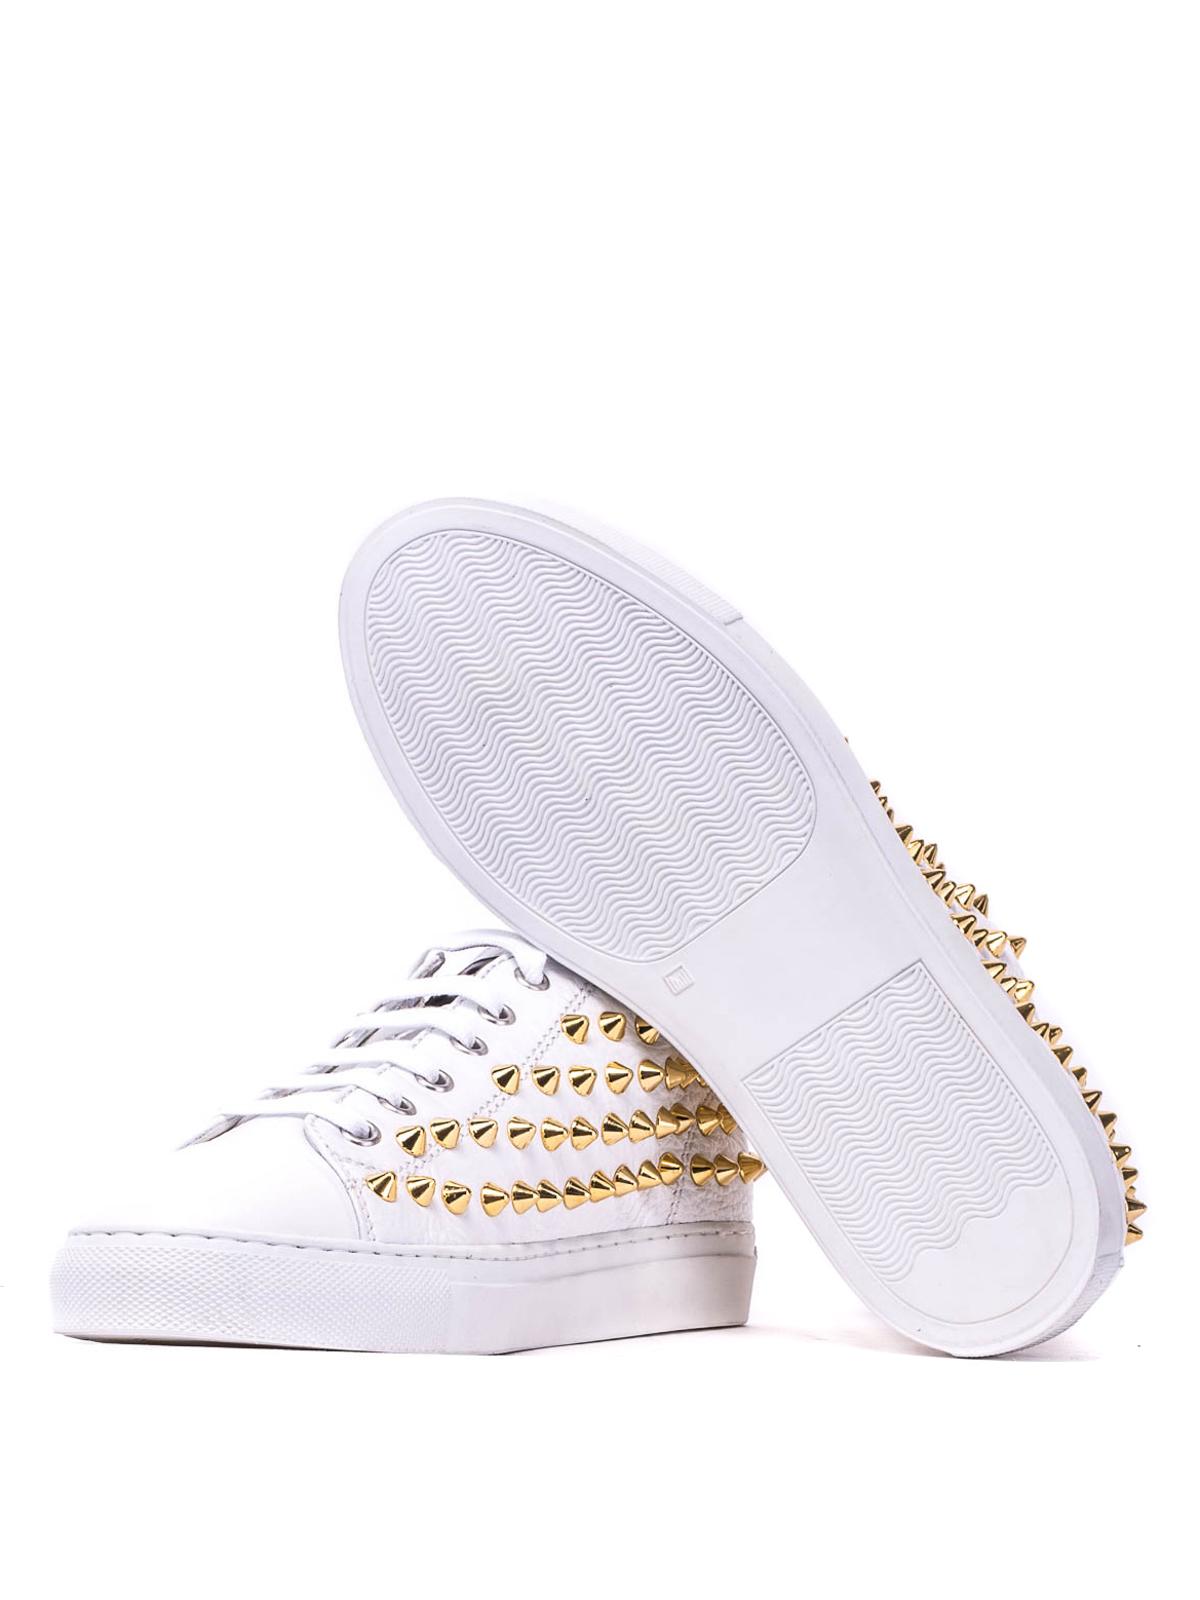 Gienchi - Sneaker basse in pelle e borchie - sneakers - GXD020P331CER0B 497435d577c